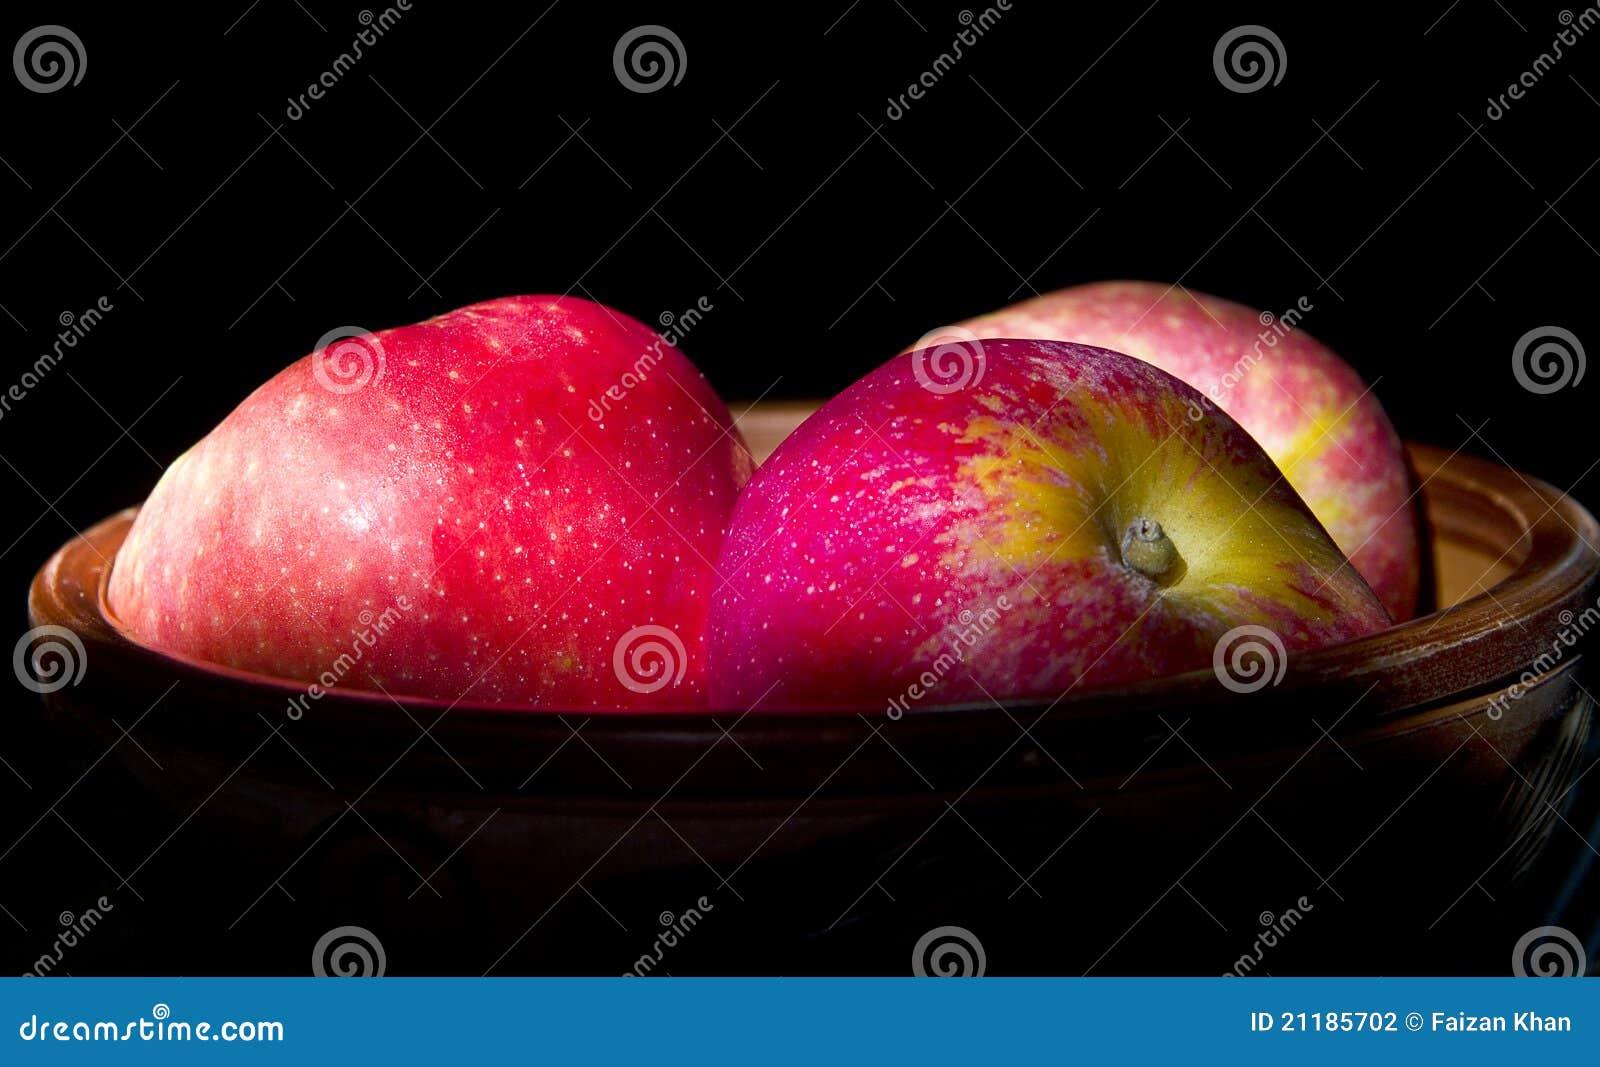 Apples on Black Background